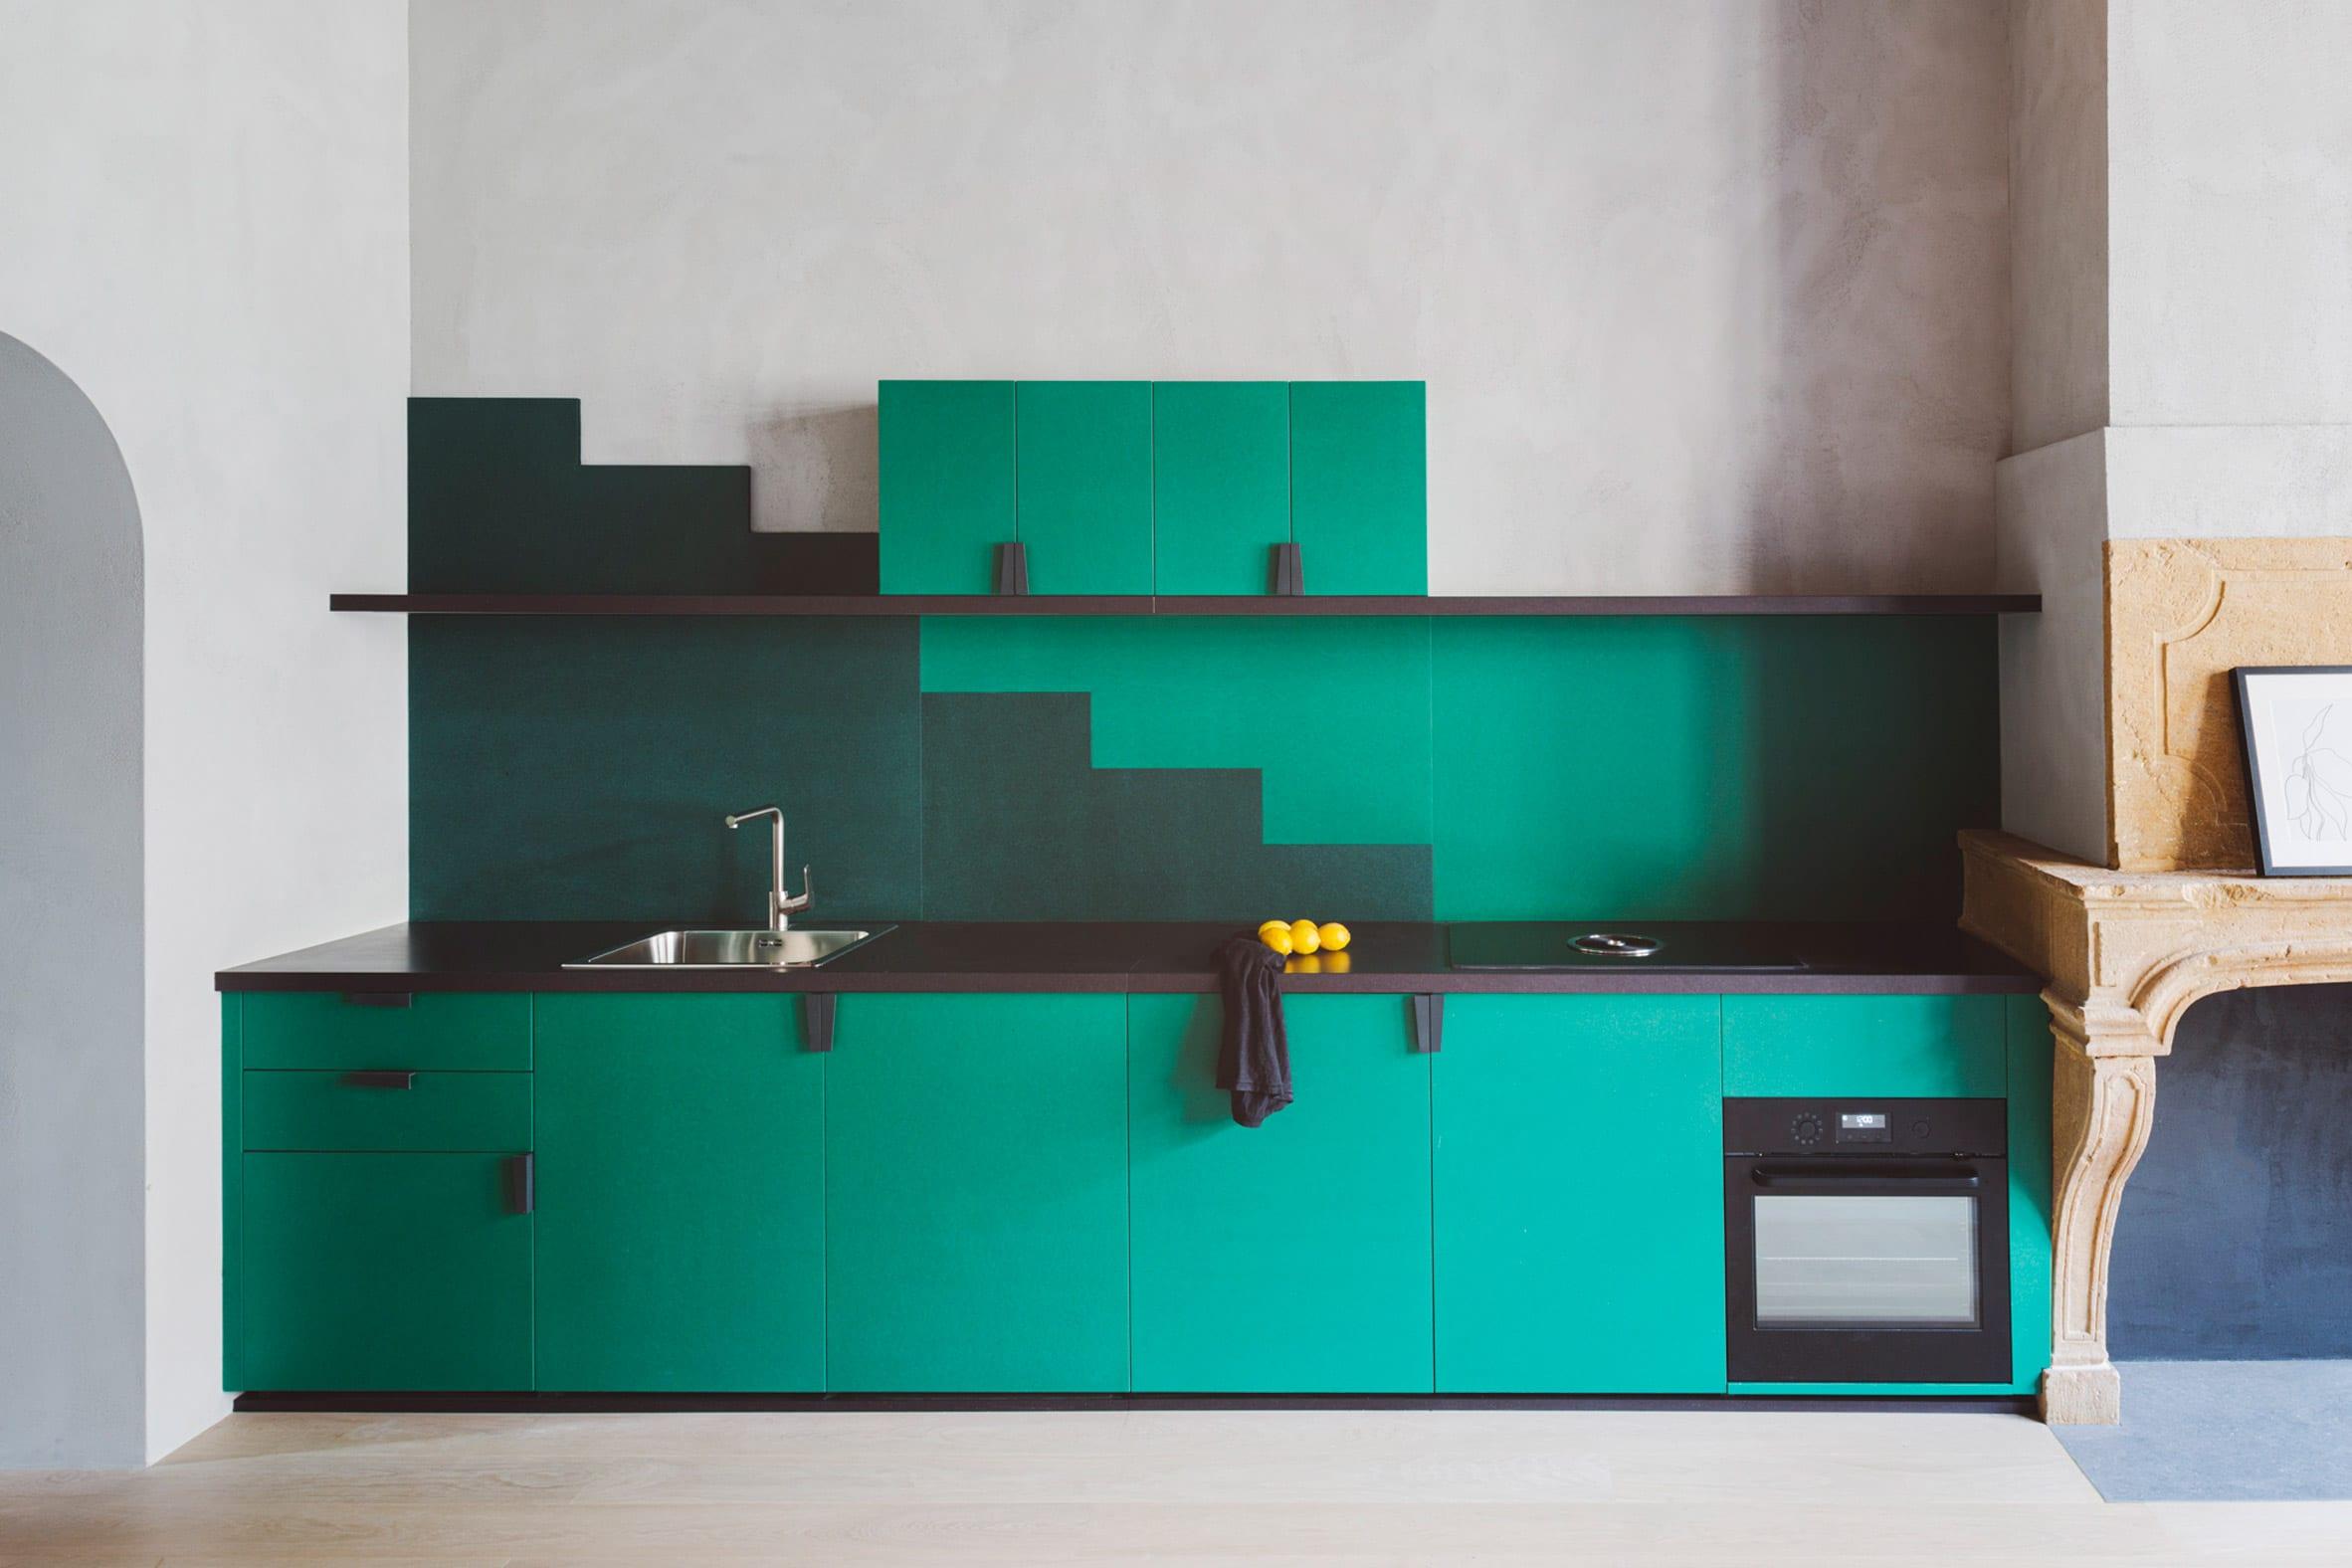 Green geometric one-wall kitchen by Studio Razavi